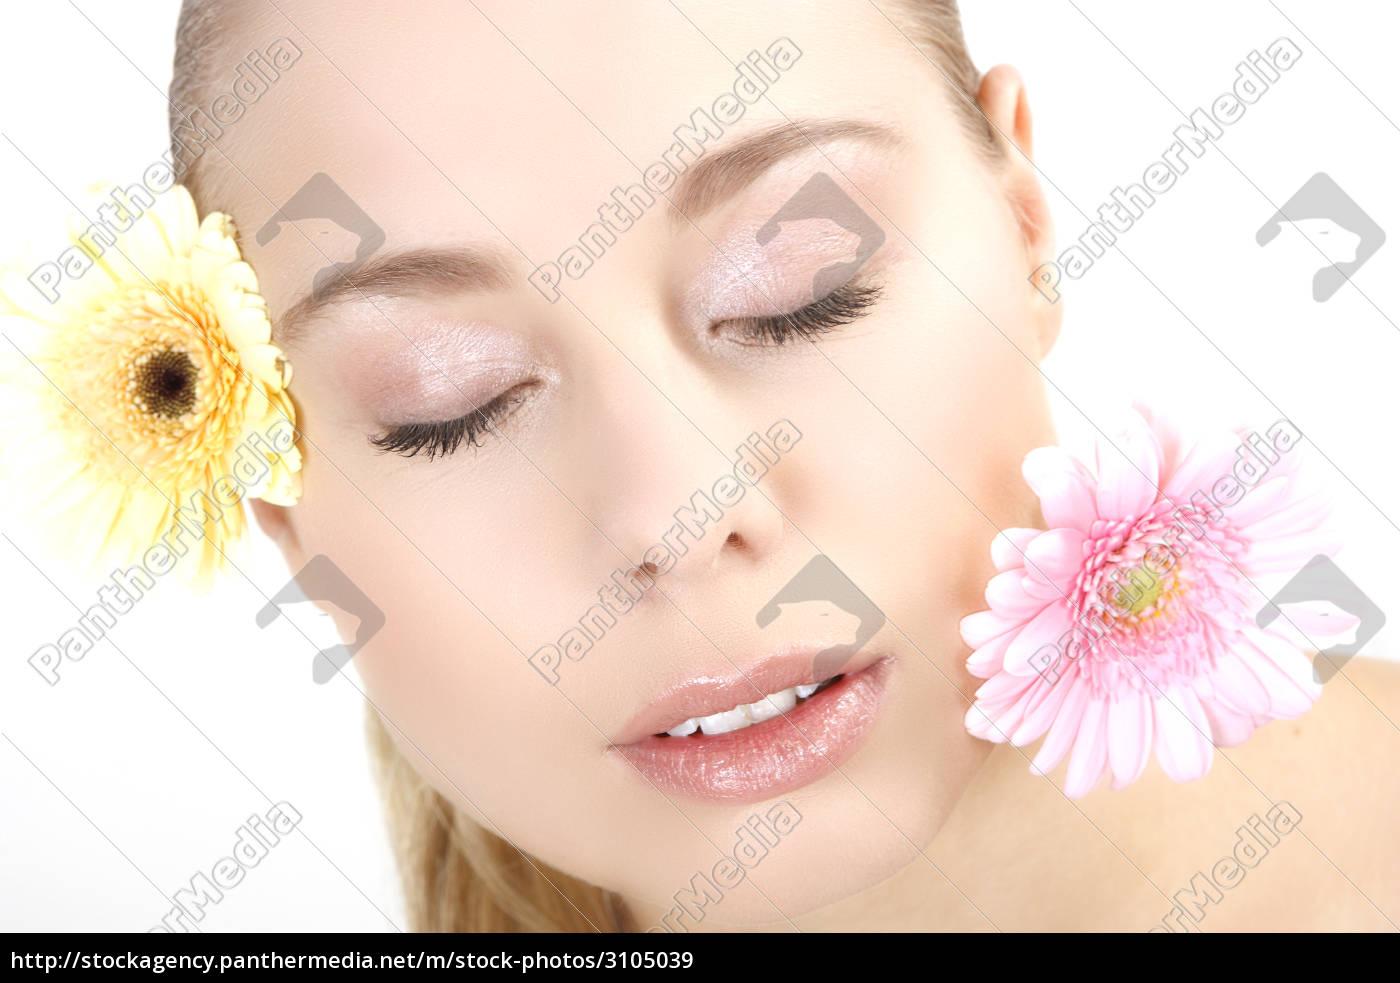 portrait, wellness - 3105039